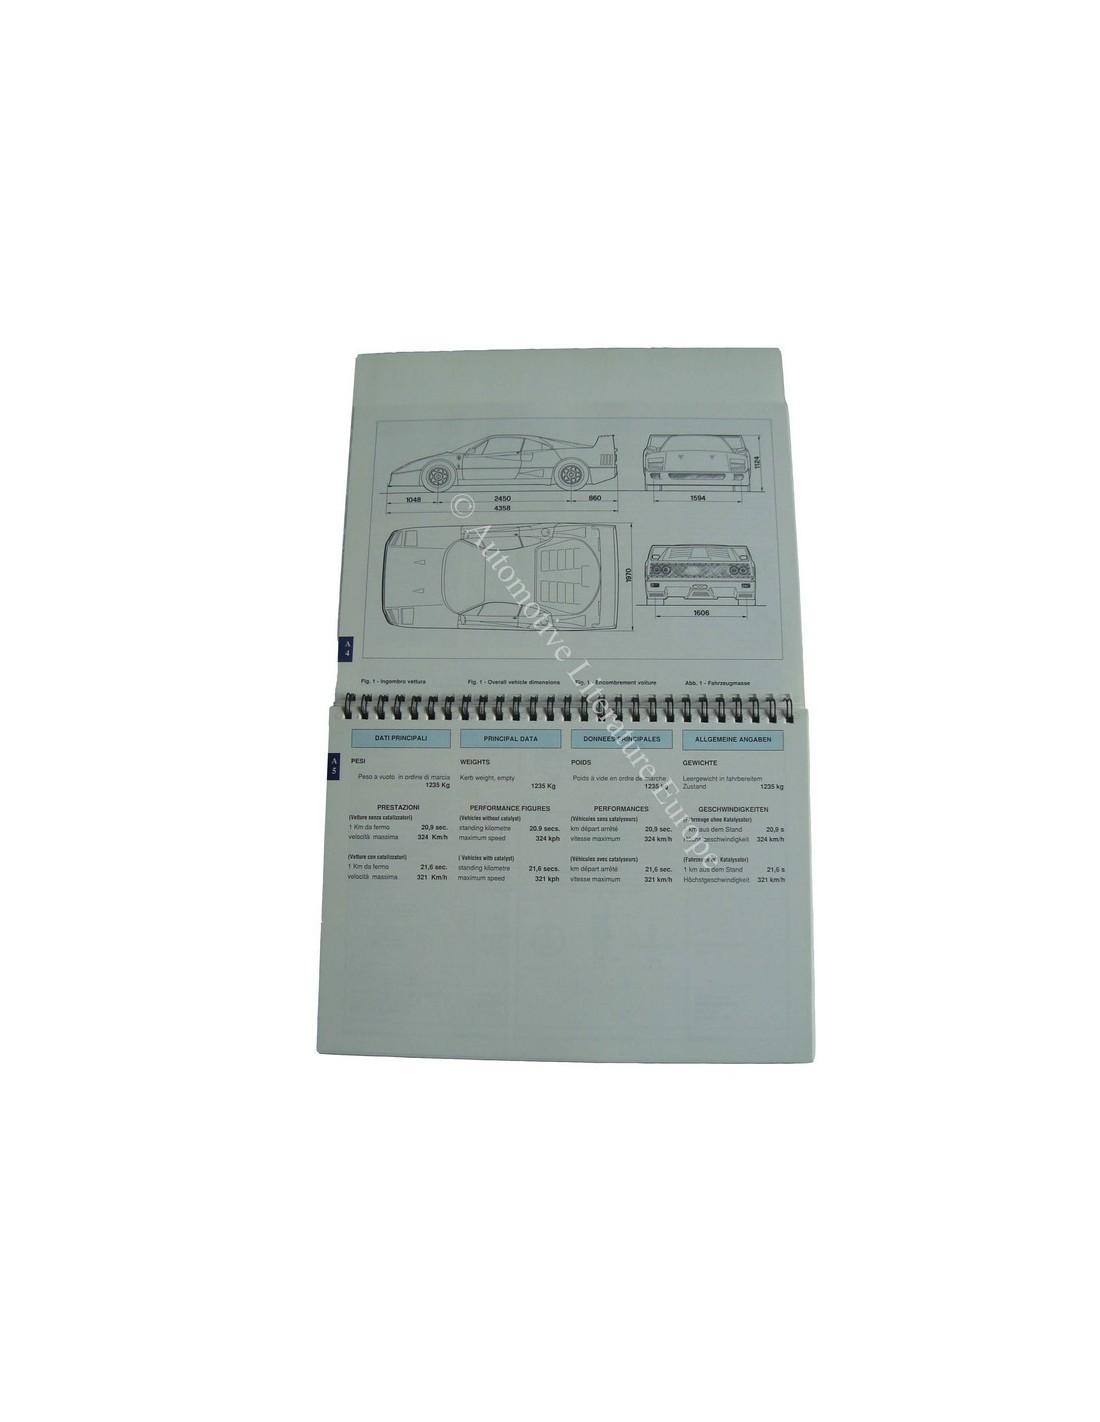 Ferrari Repair Manuals: 1988 FERRARI F40 OWNERS MANUAL 512A/88